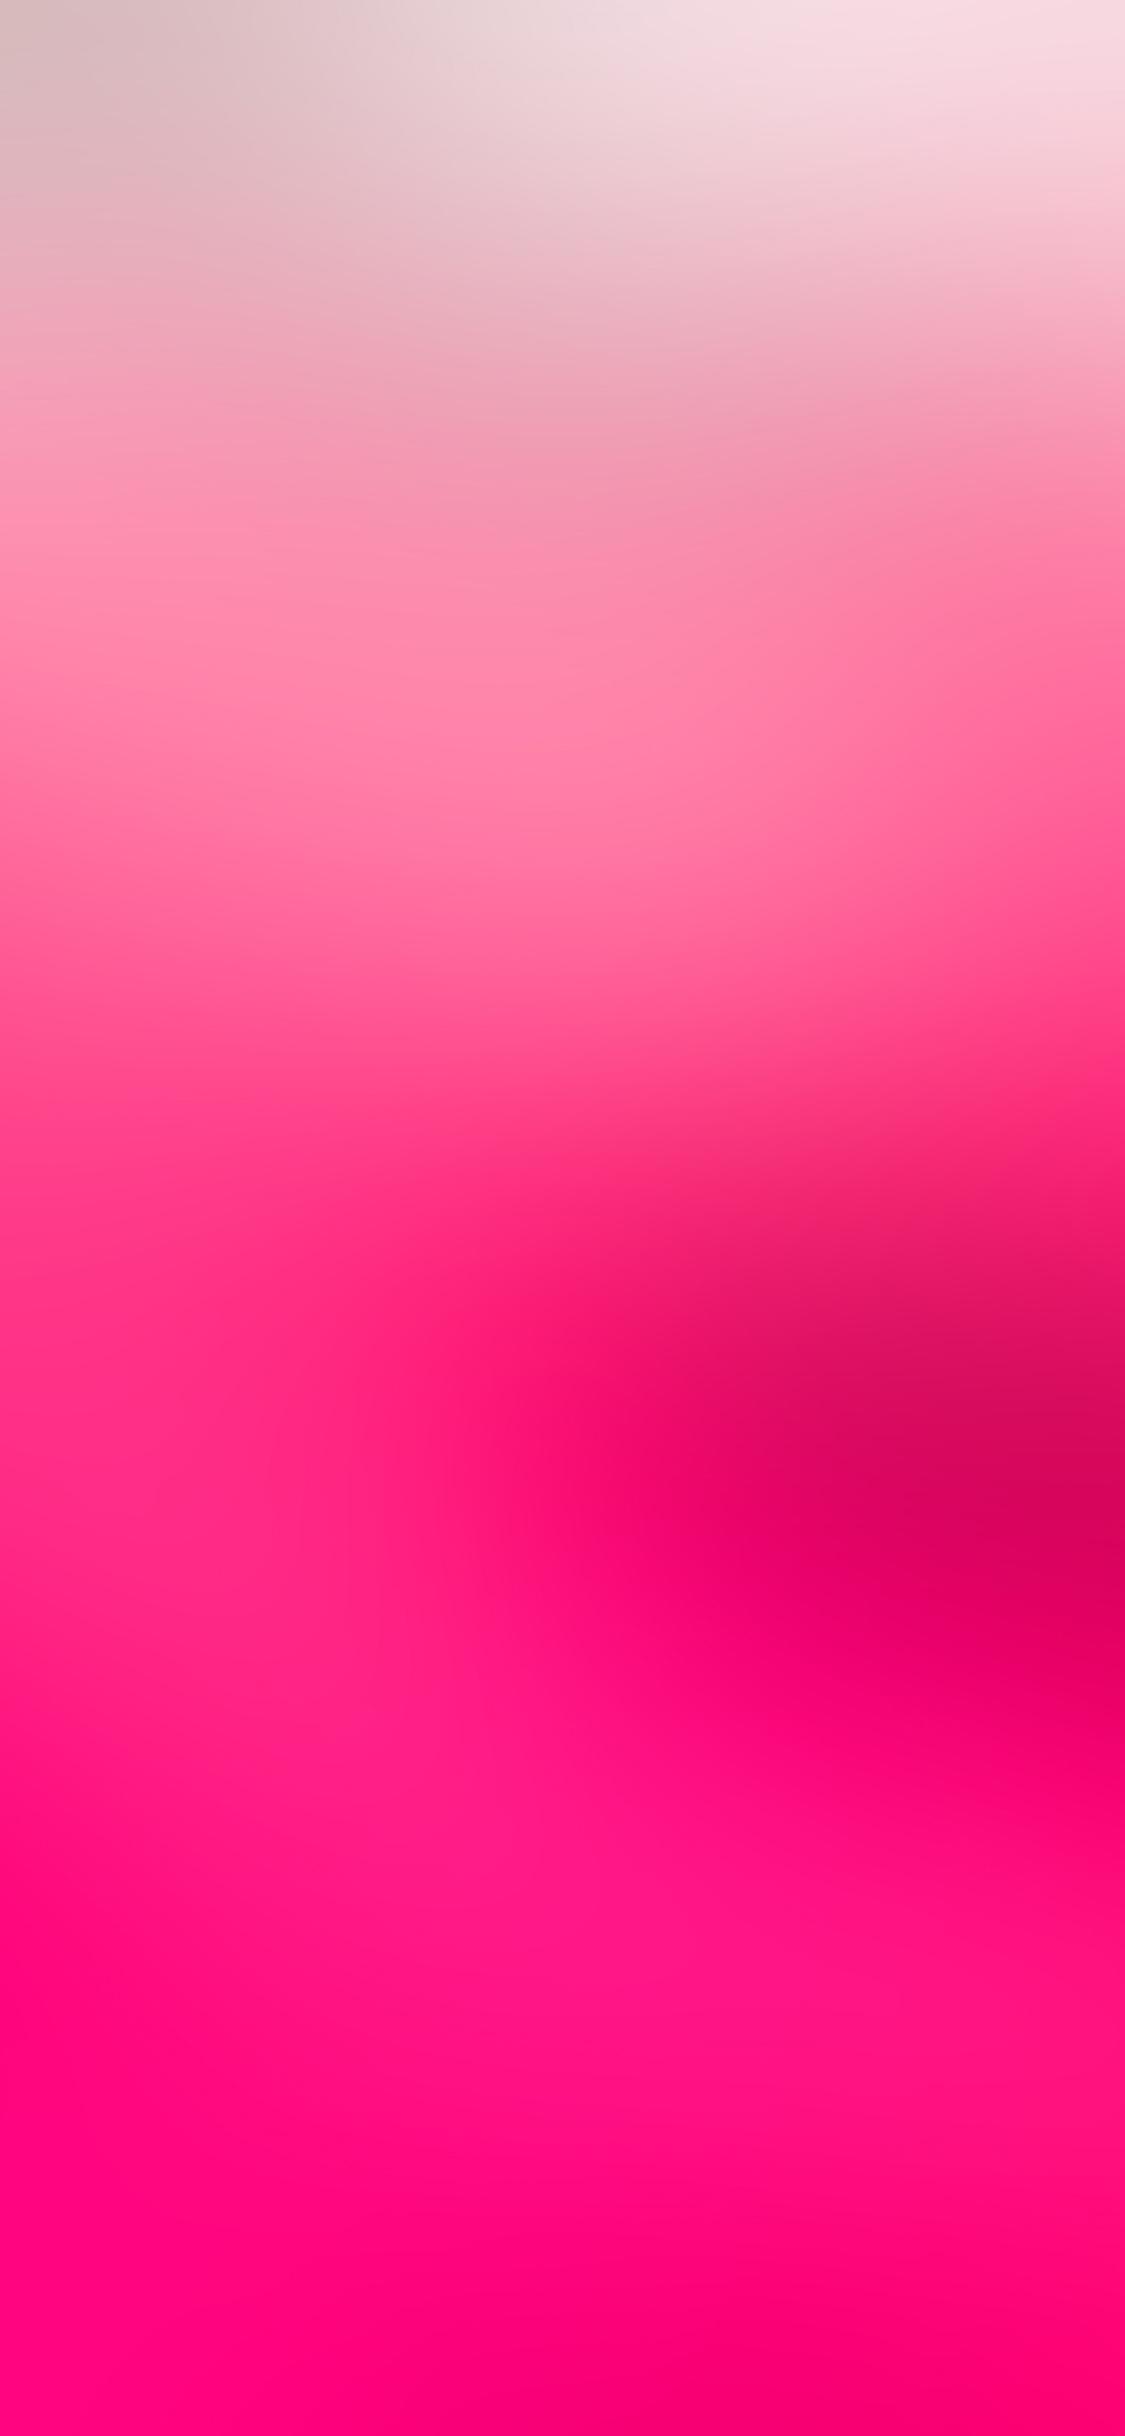 iPhoneXpapers.com-Apple-iPhone-wallpaper-sb03-wallpaper-pink-panther-blur